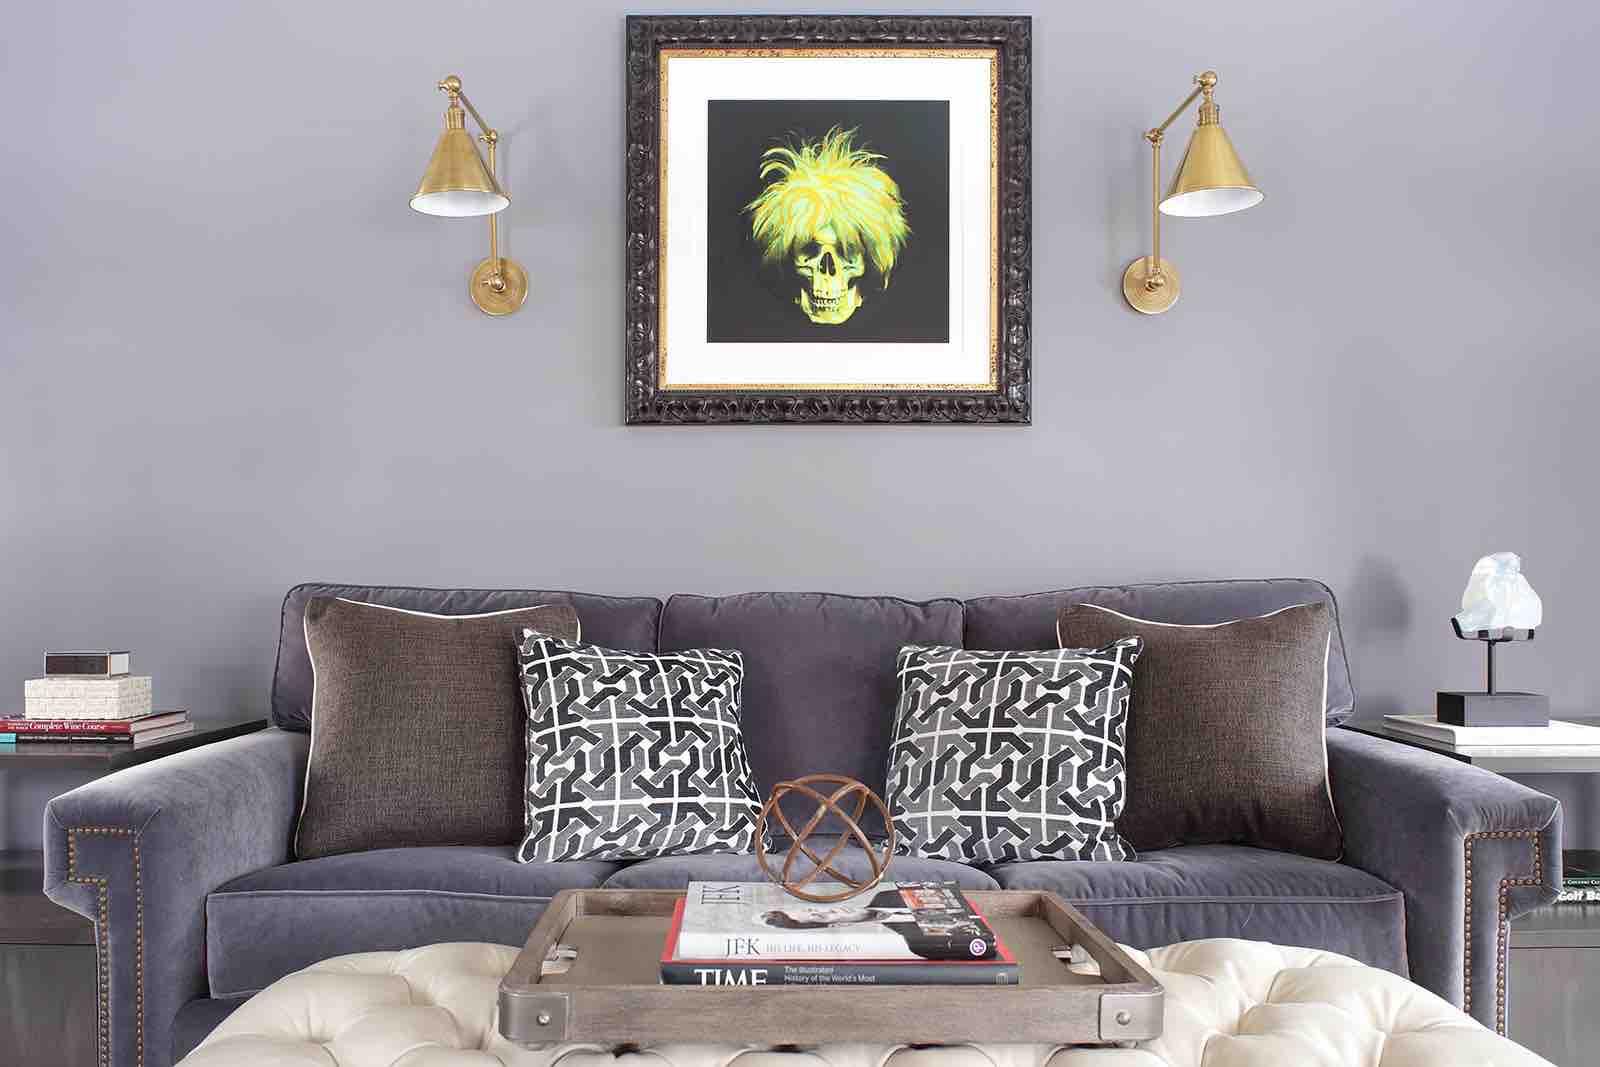 Ron English Art in a Valerie Grant Interiors Designed Room